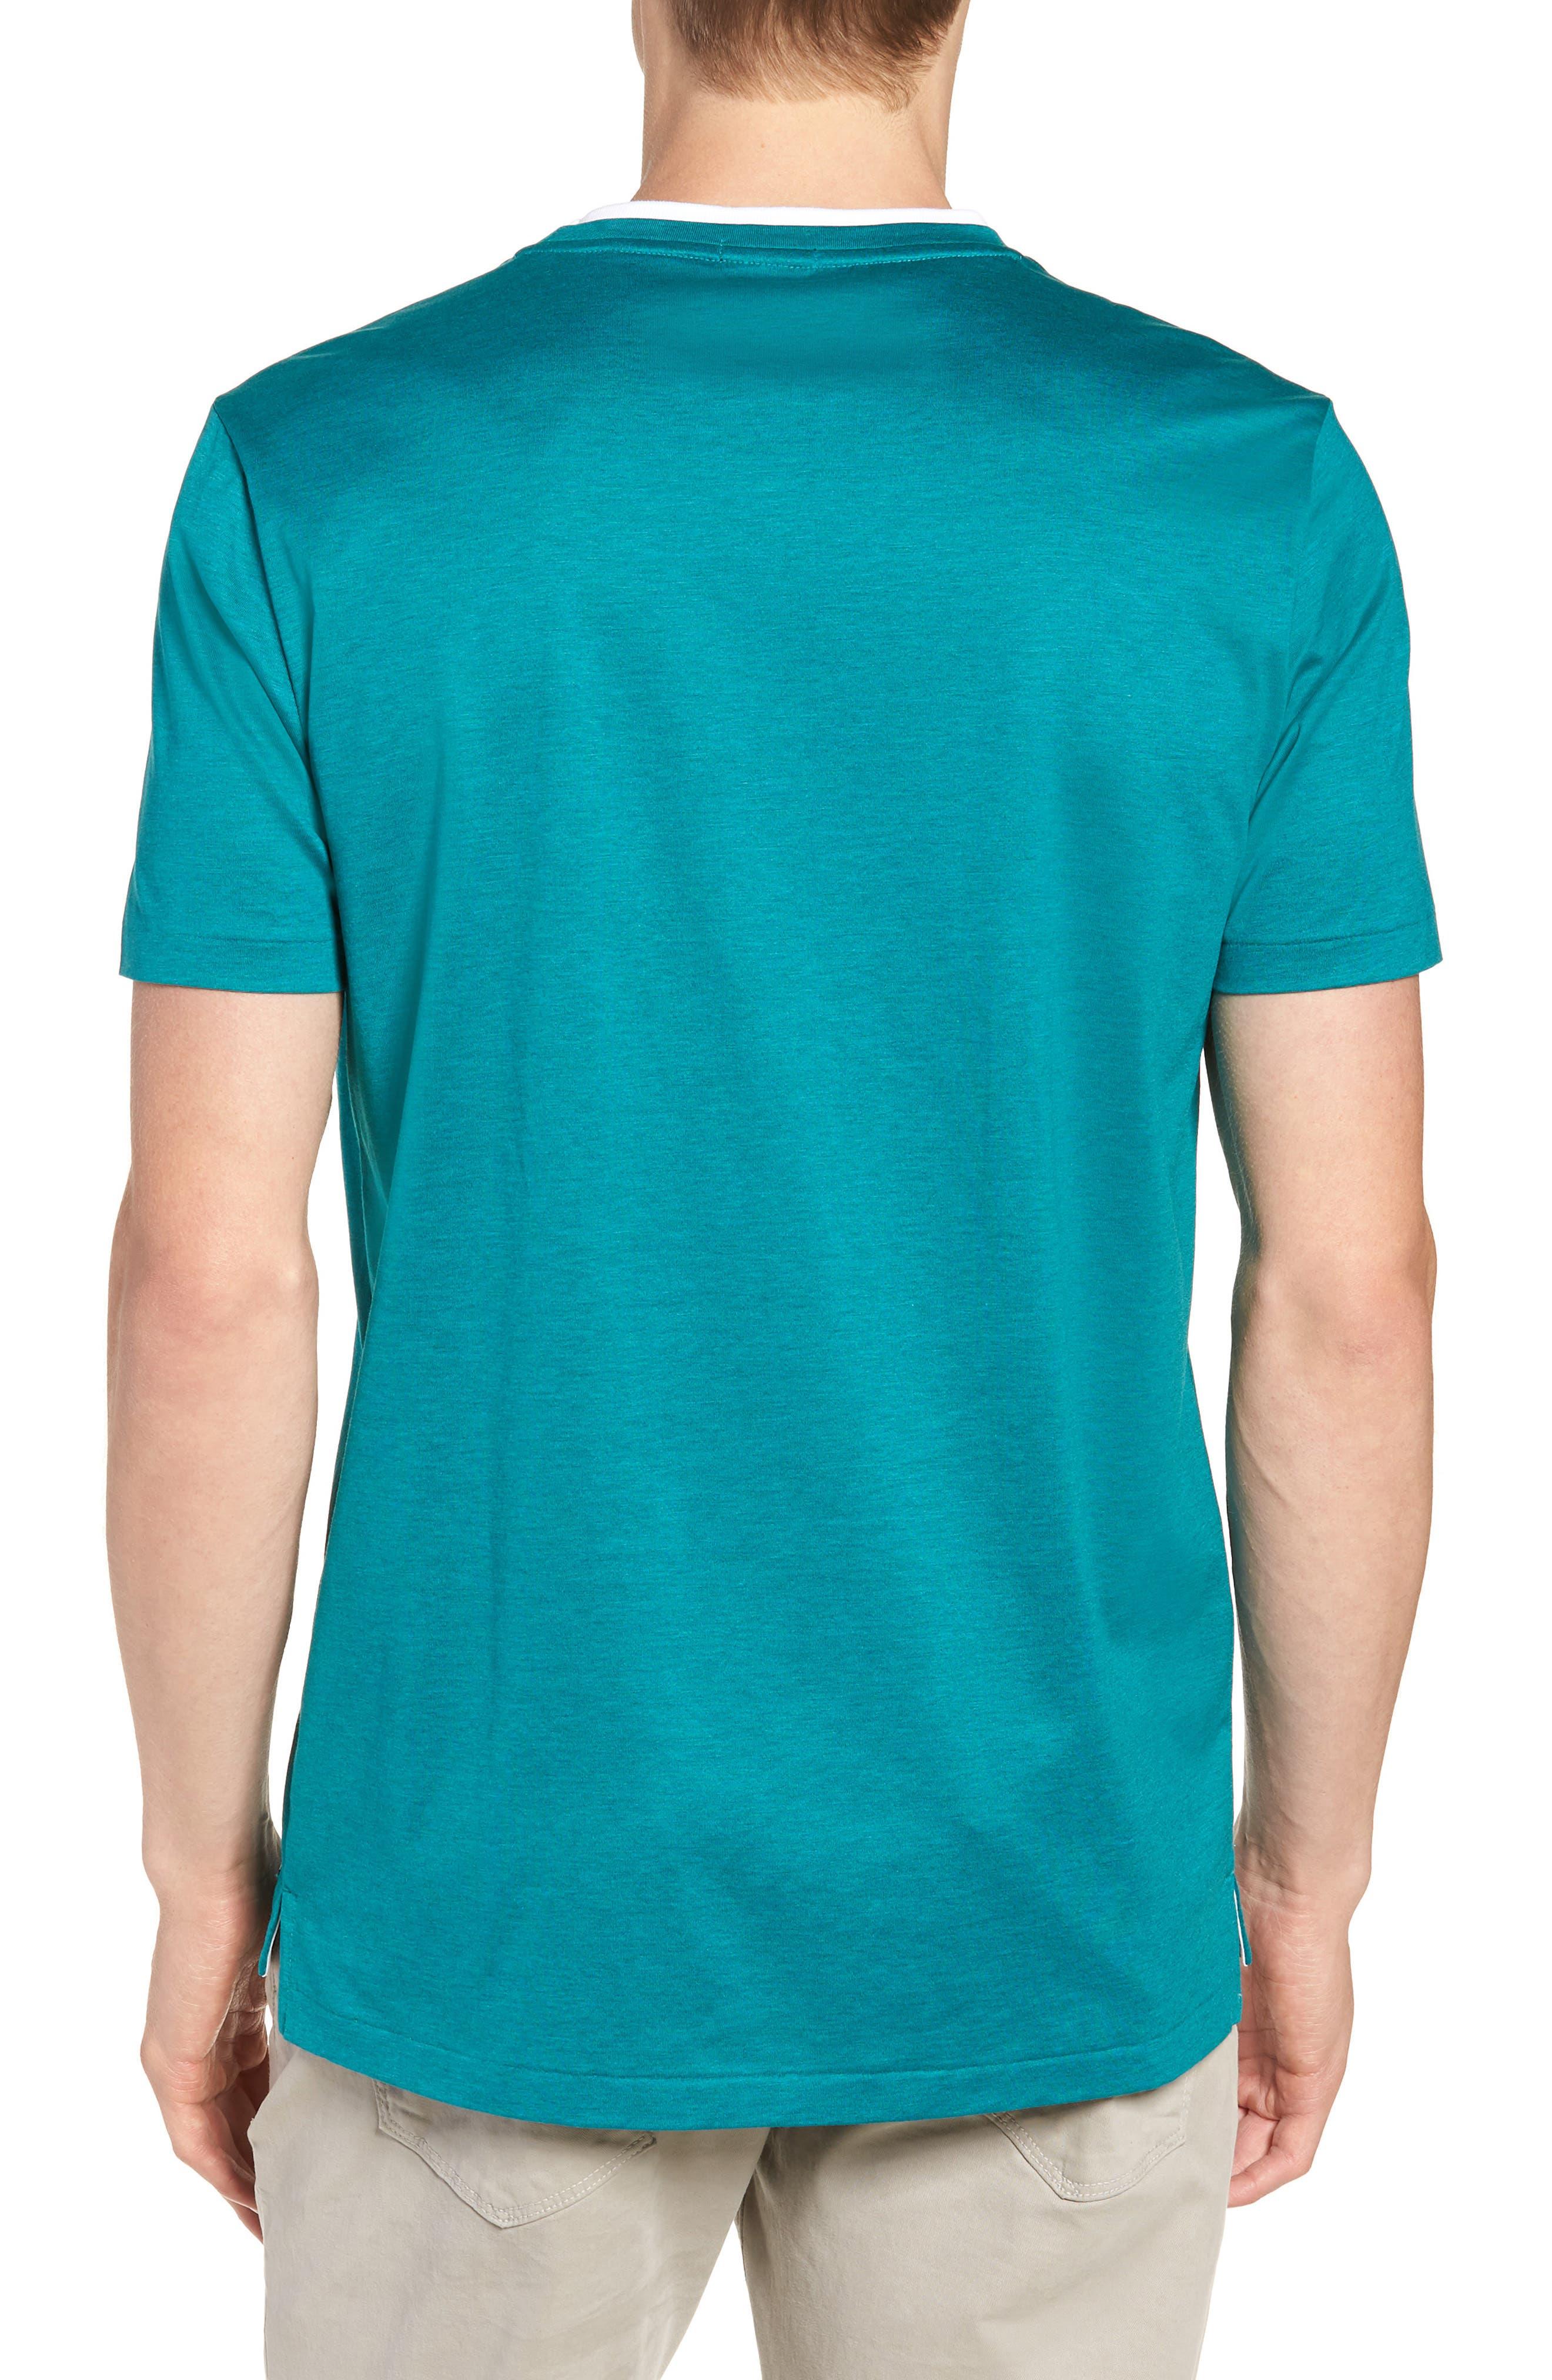 Taber Regular Fit T-Shirt,                             Alternate thumbnail 2, color,                             312